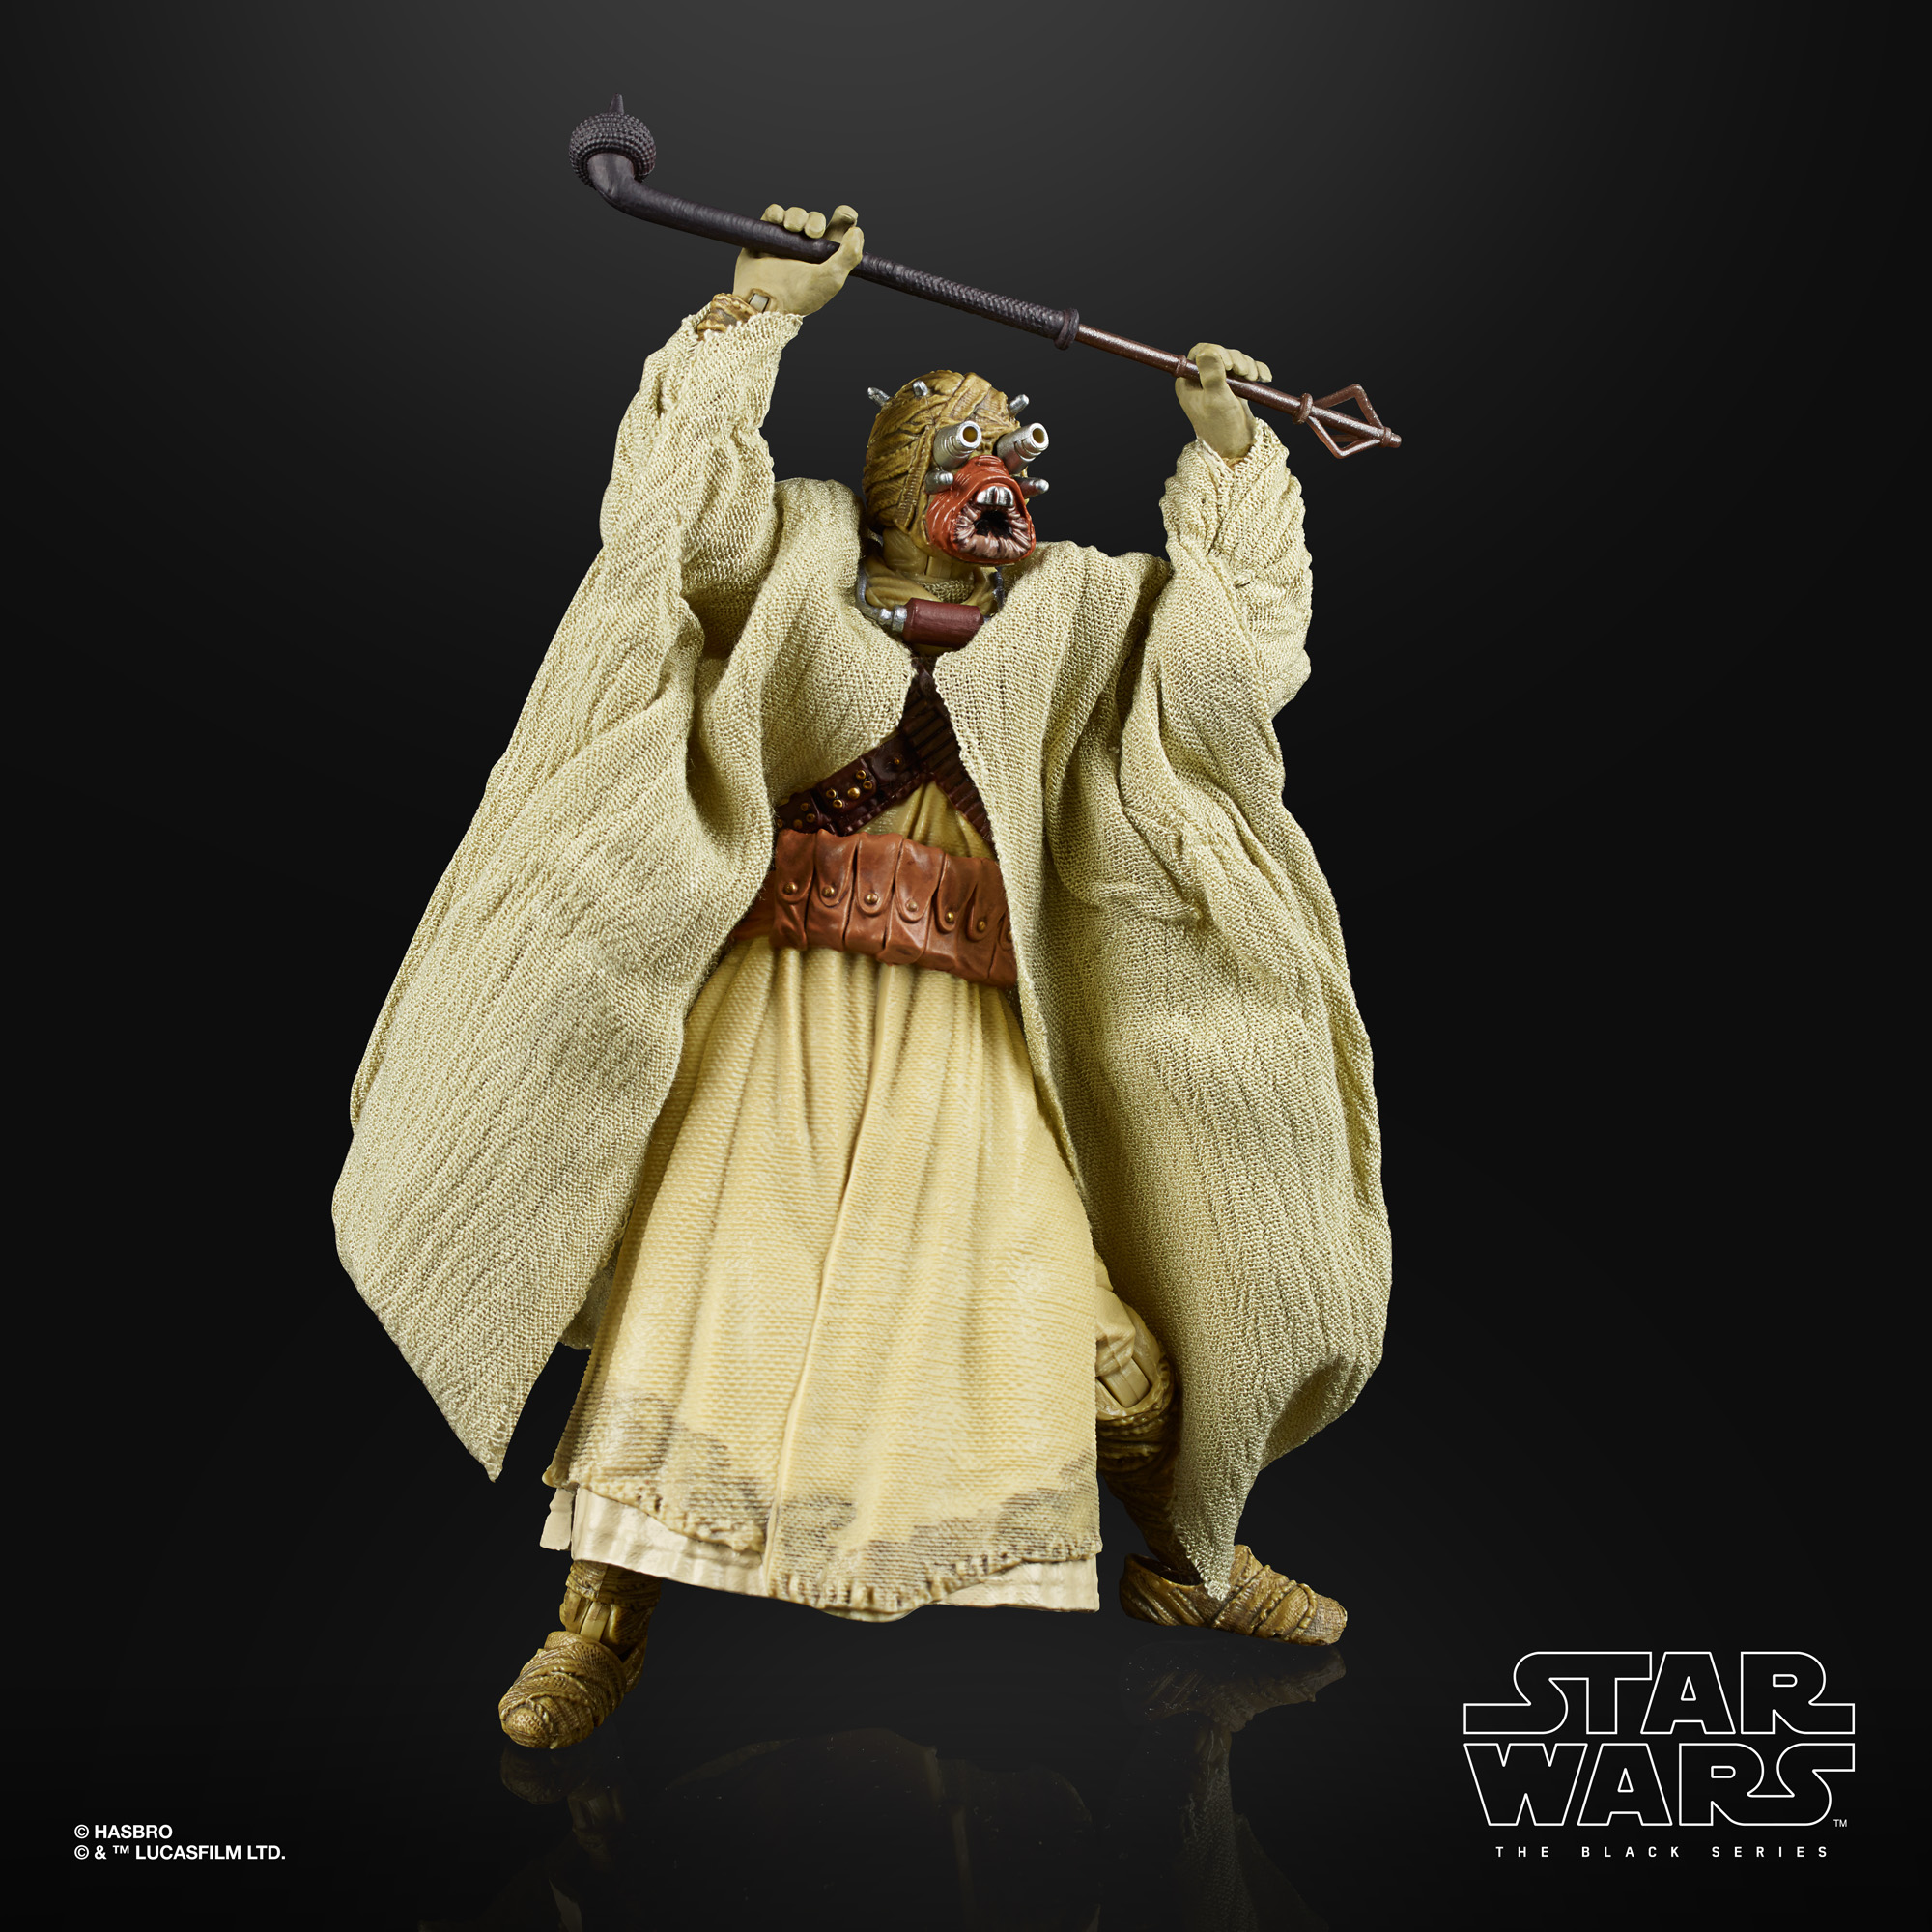 Star Wars The Black Series Archive Line Tusken Raider 15cm F19045L00 5010993825370